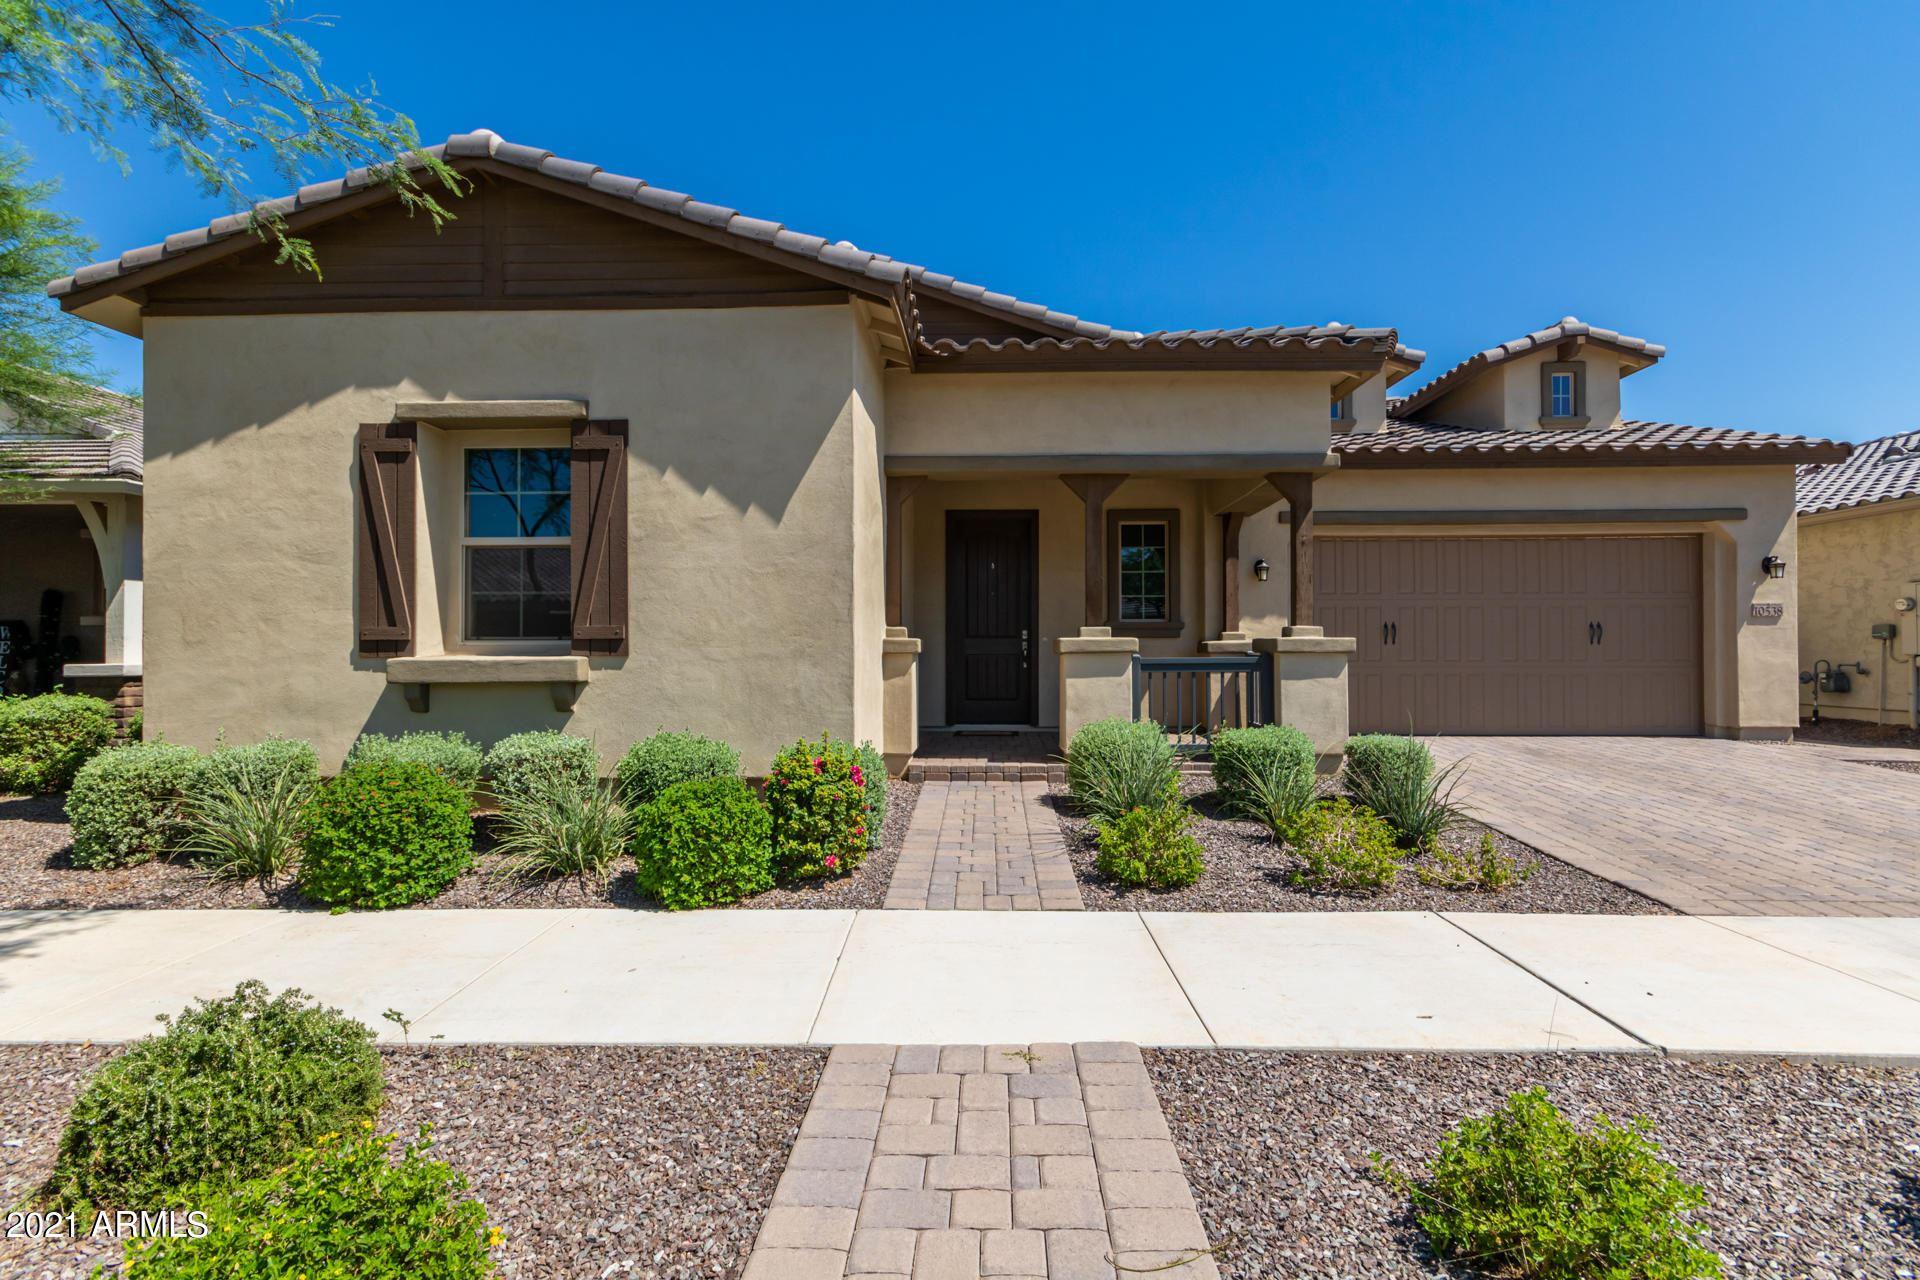 10538 E RELATIVITY Avenue, Mesa, AZ 85212 - MLS#: 6270882